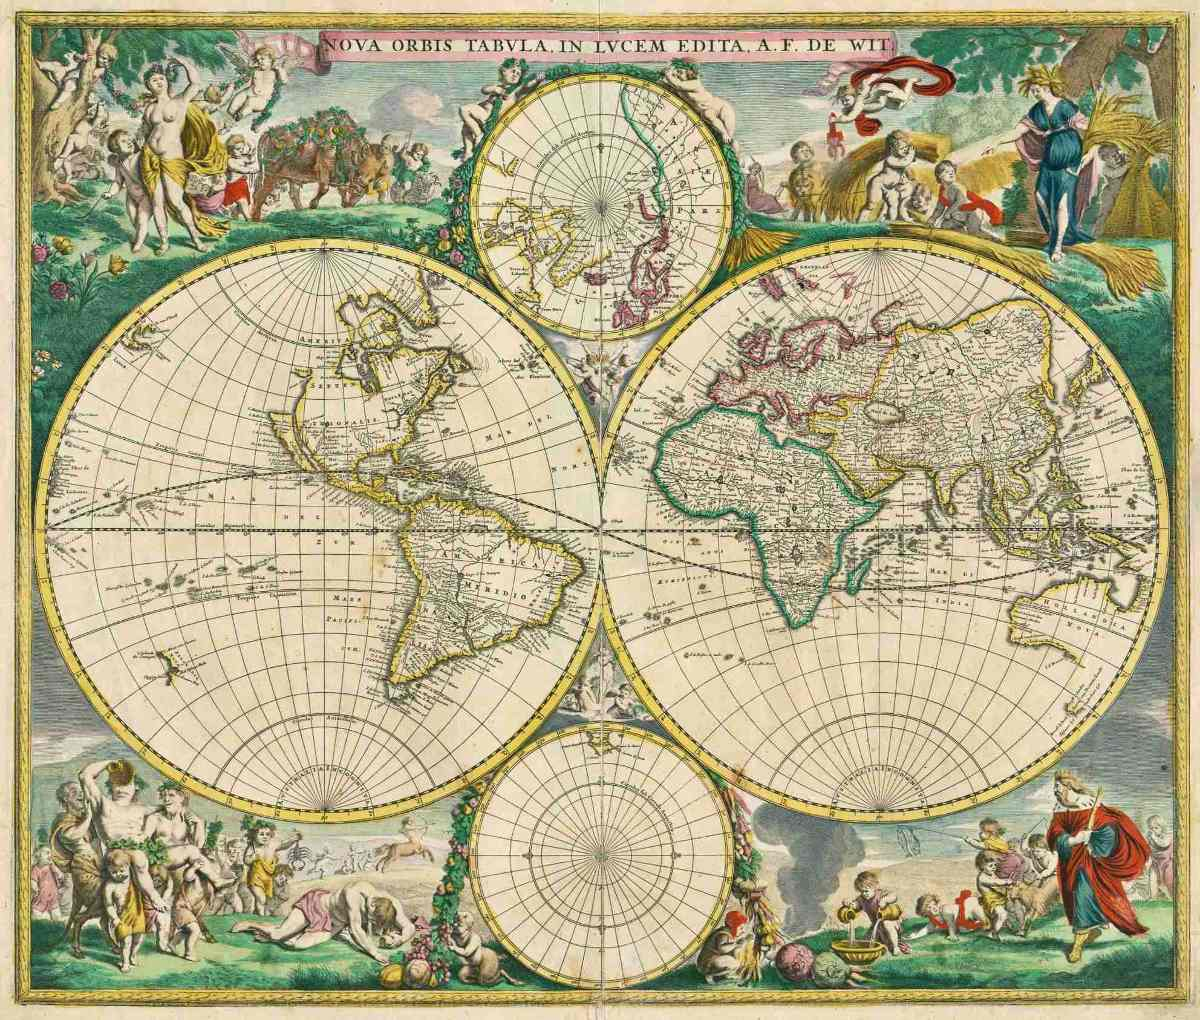 Lienzo tela mapa mundi 1670 60 x 70 cm raro cartograf a - Cuadro mapamundi ikea ...